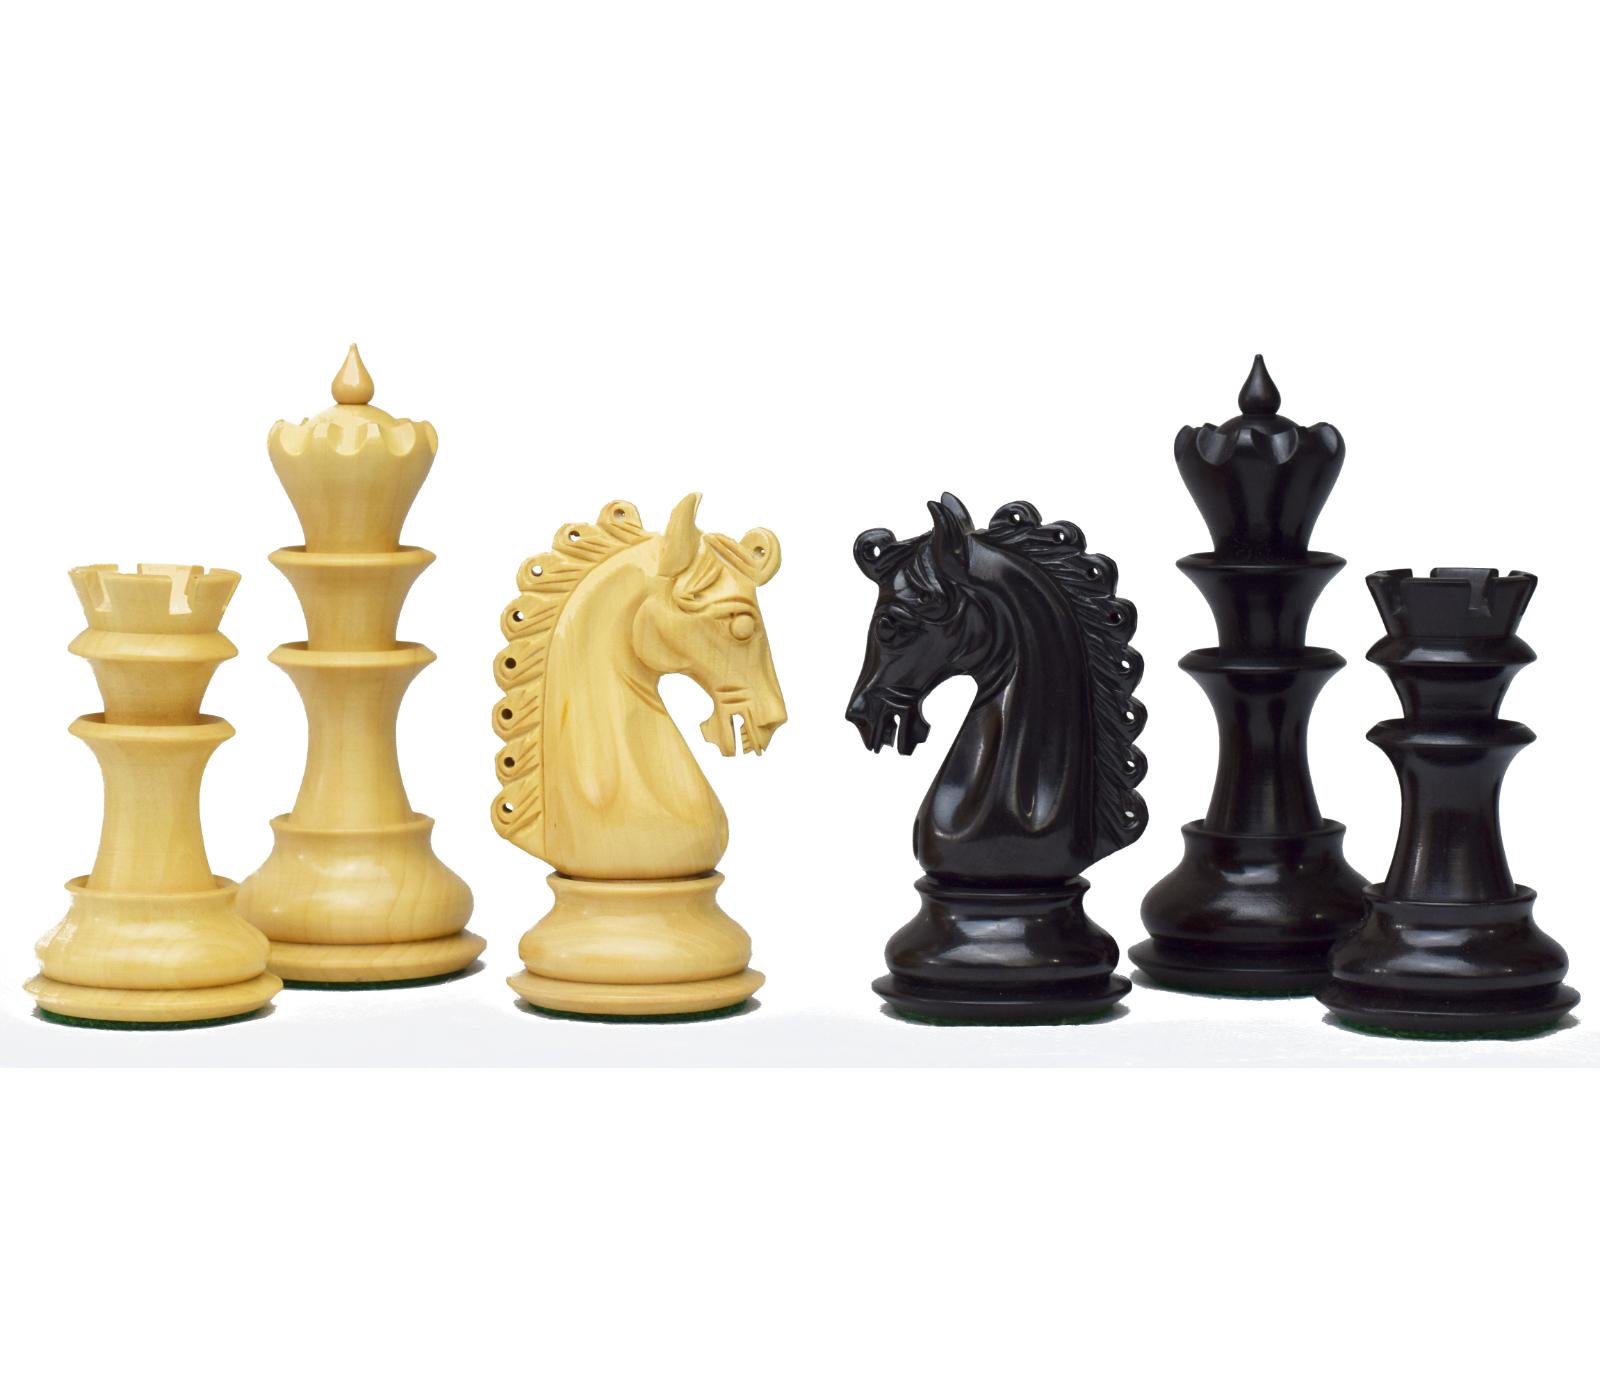 ROOGU The Roman Empire 4.7'' XL Luxury Chess Pieces Figure Set Storage Suitcase